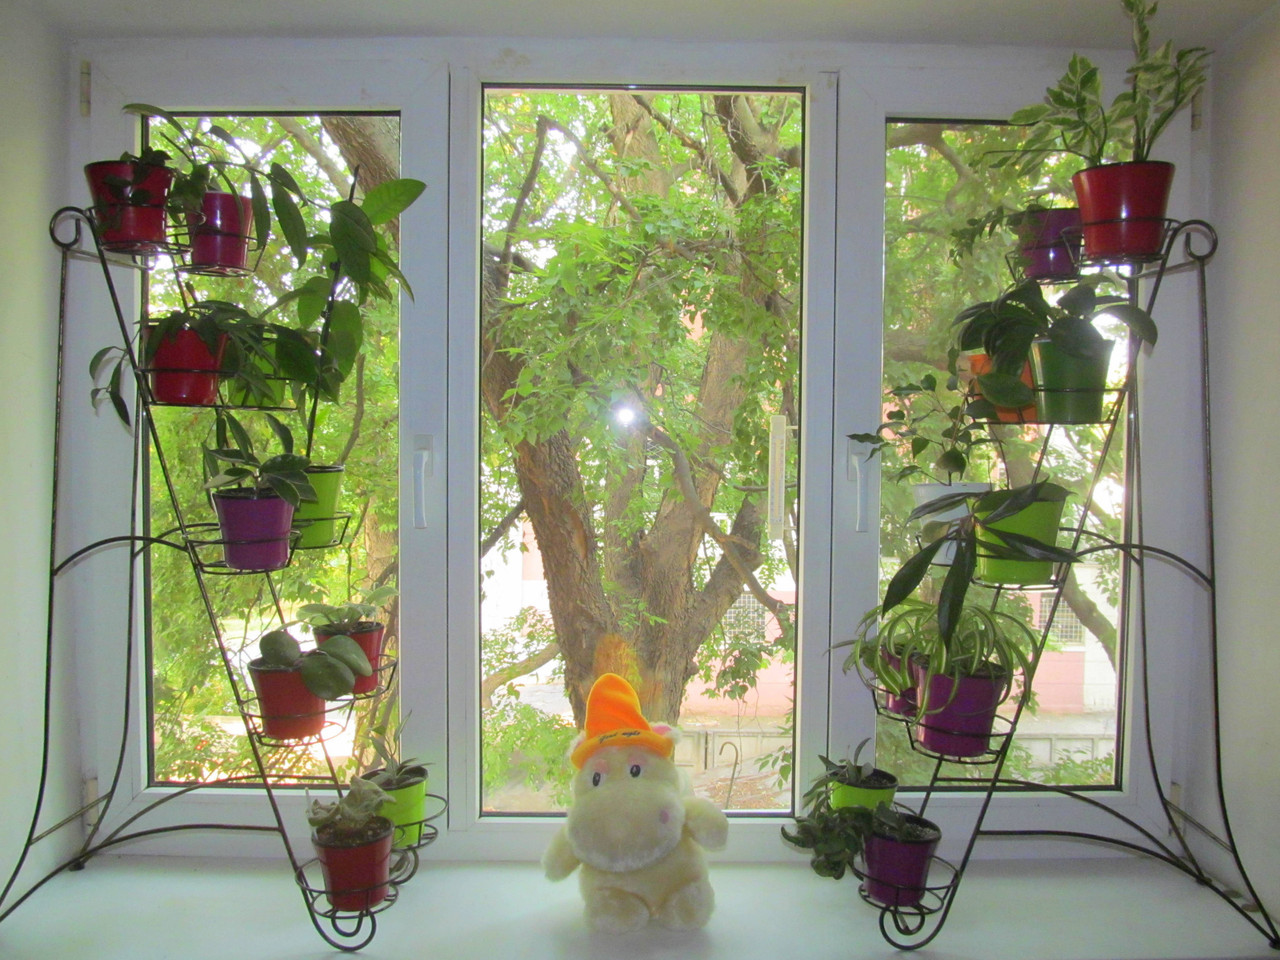 Подставки для цветов на подоконник Условия для выращивания цветов на окне 556